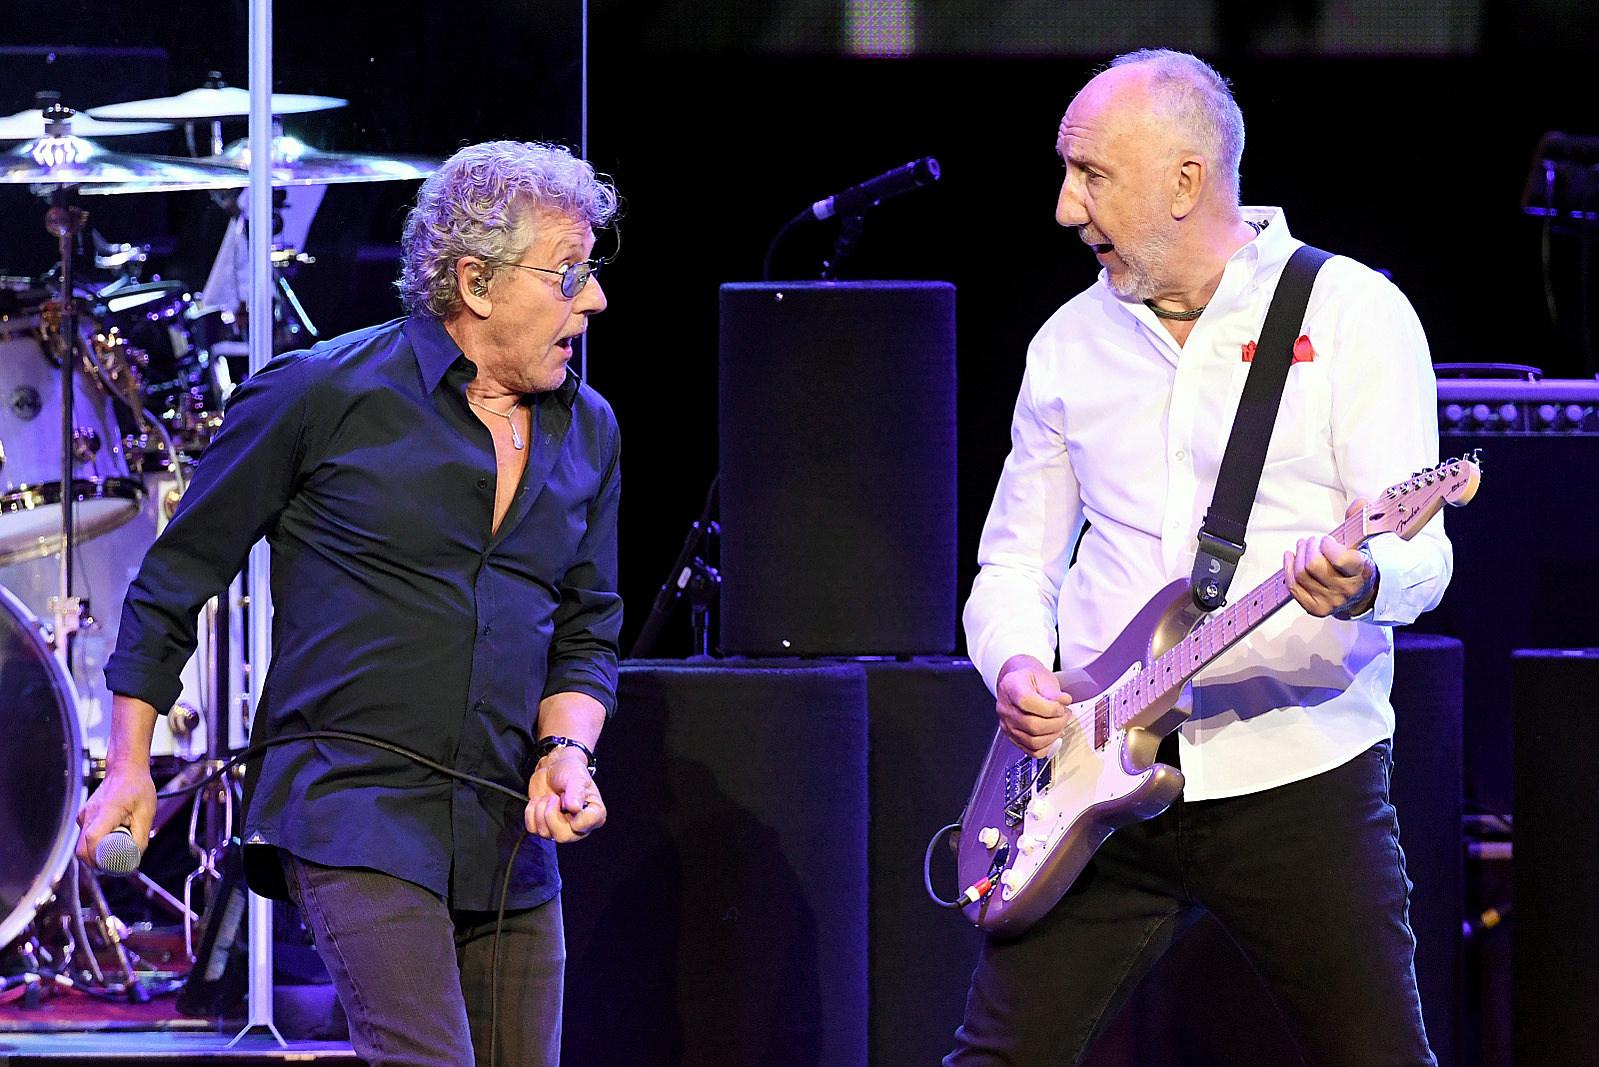 Pete Townshend Says Touring Is 'No Fun'